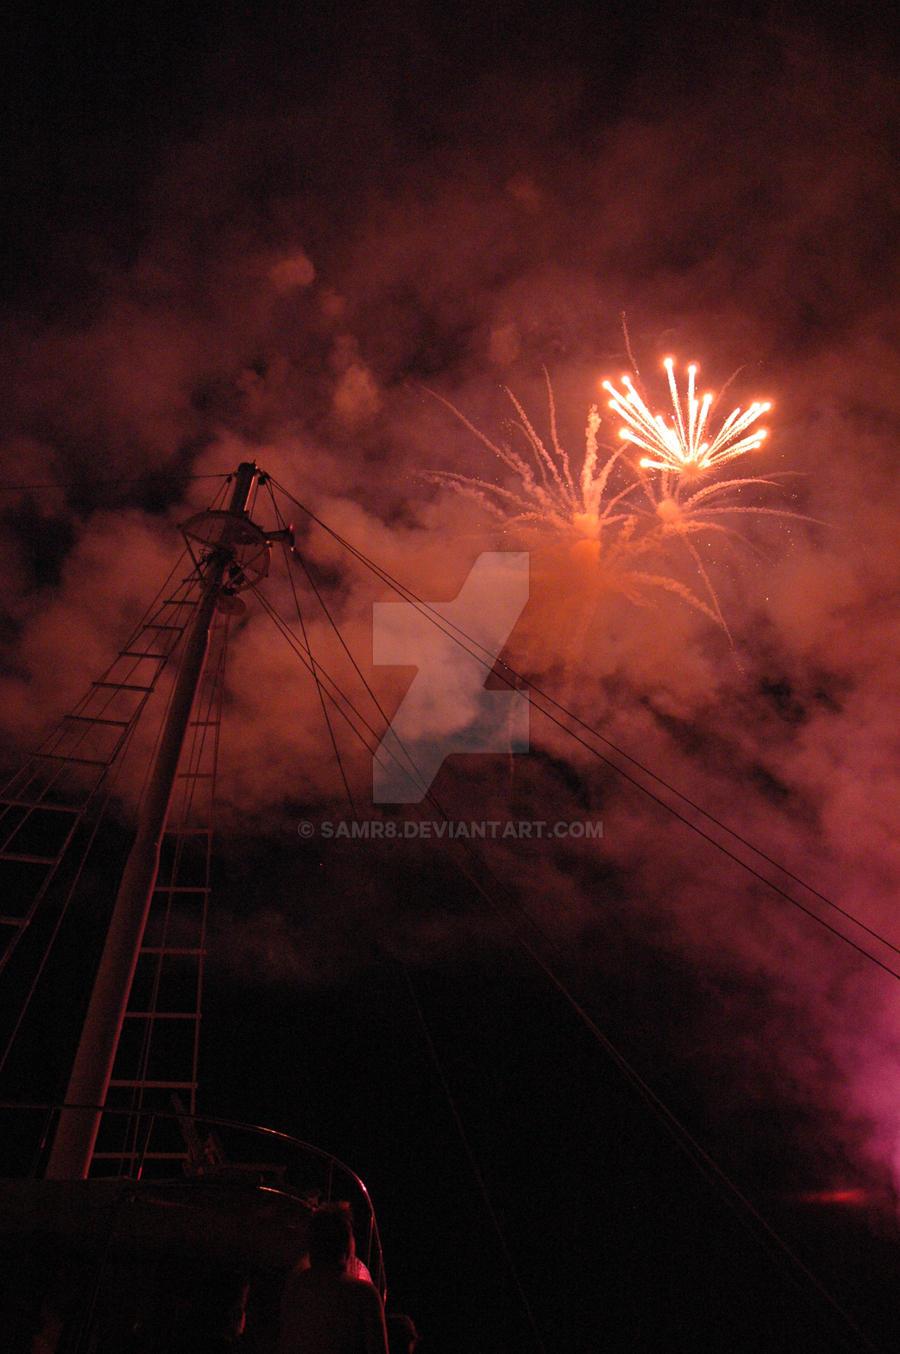 Feuerwerk 5 by SamR8